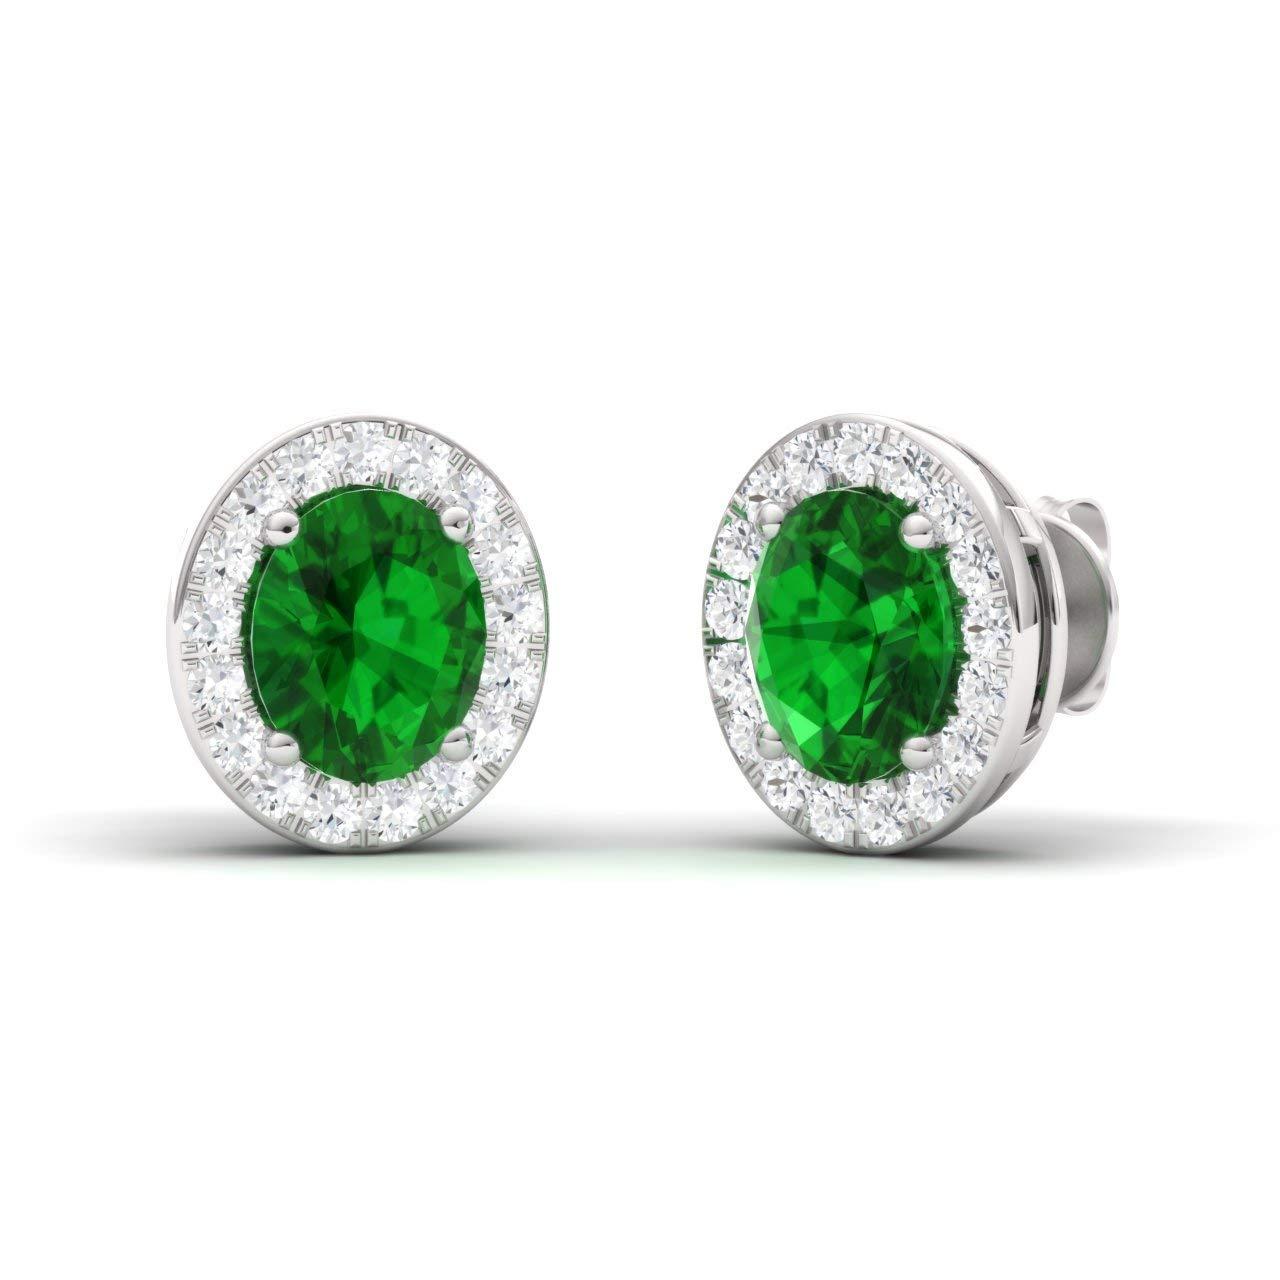 Diamondere Natural and Certified Oval Cut Gemstone Halo Diamond Earrings in 14K White Gold | 0.96 Carat Earrings for Women